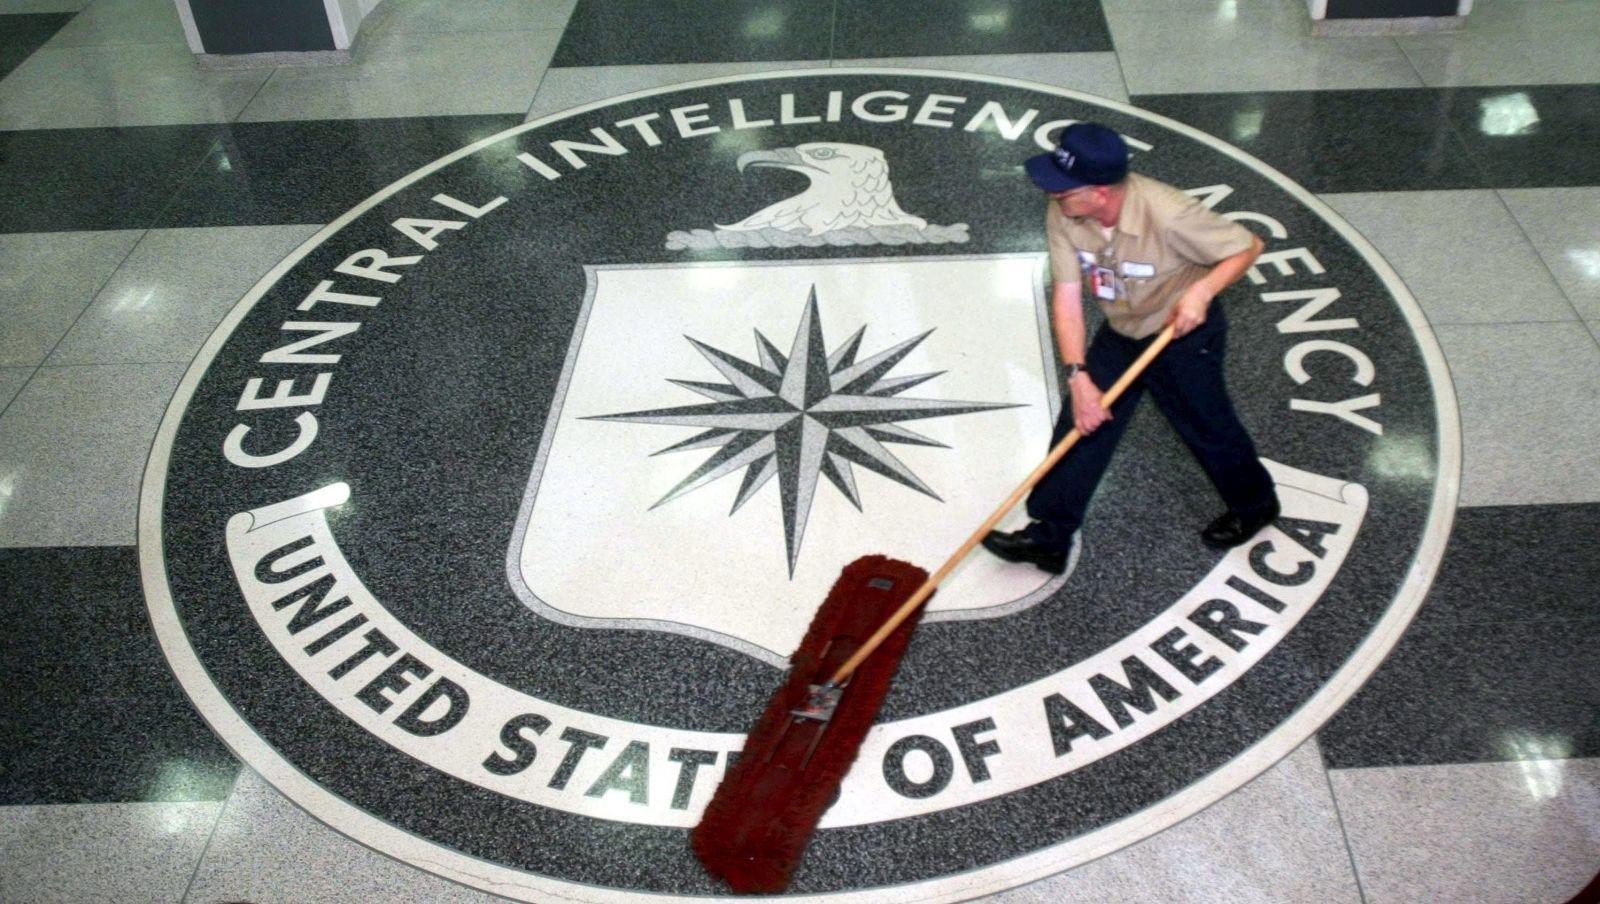 Petugas kebersihan saat tengah menyapu lantai berlogo CIA. Foto: USA Today/